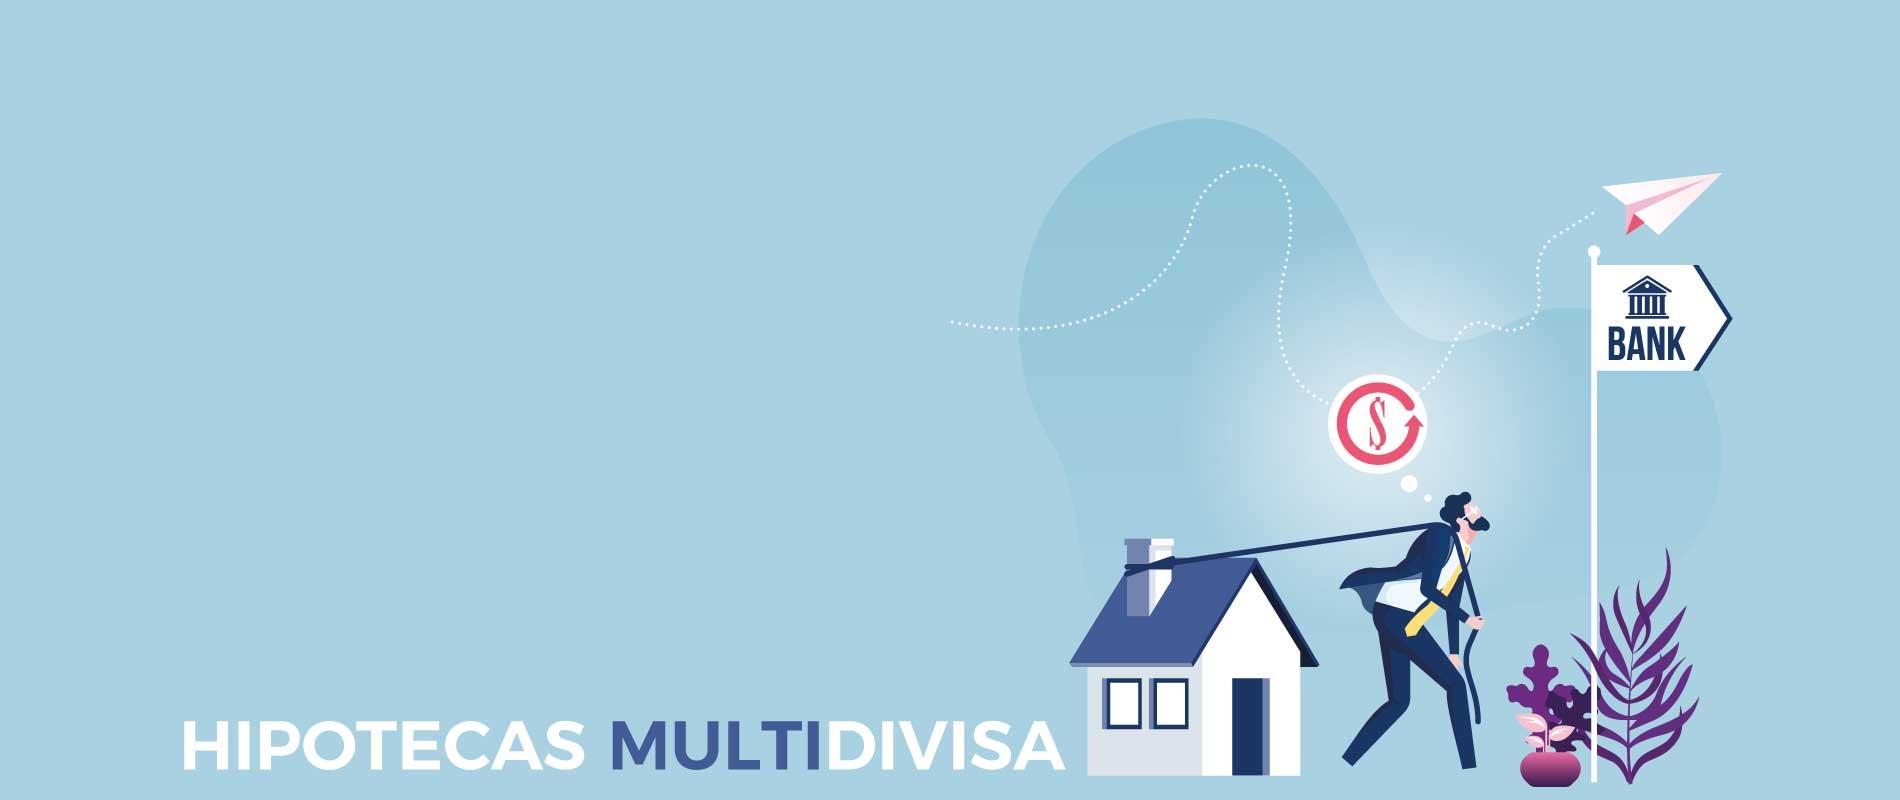 hipotecas-multidivisa-reclamacion